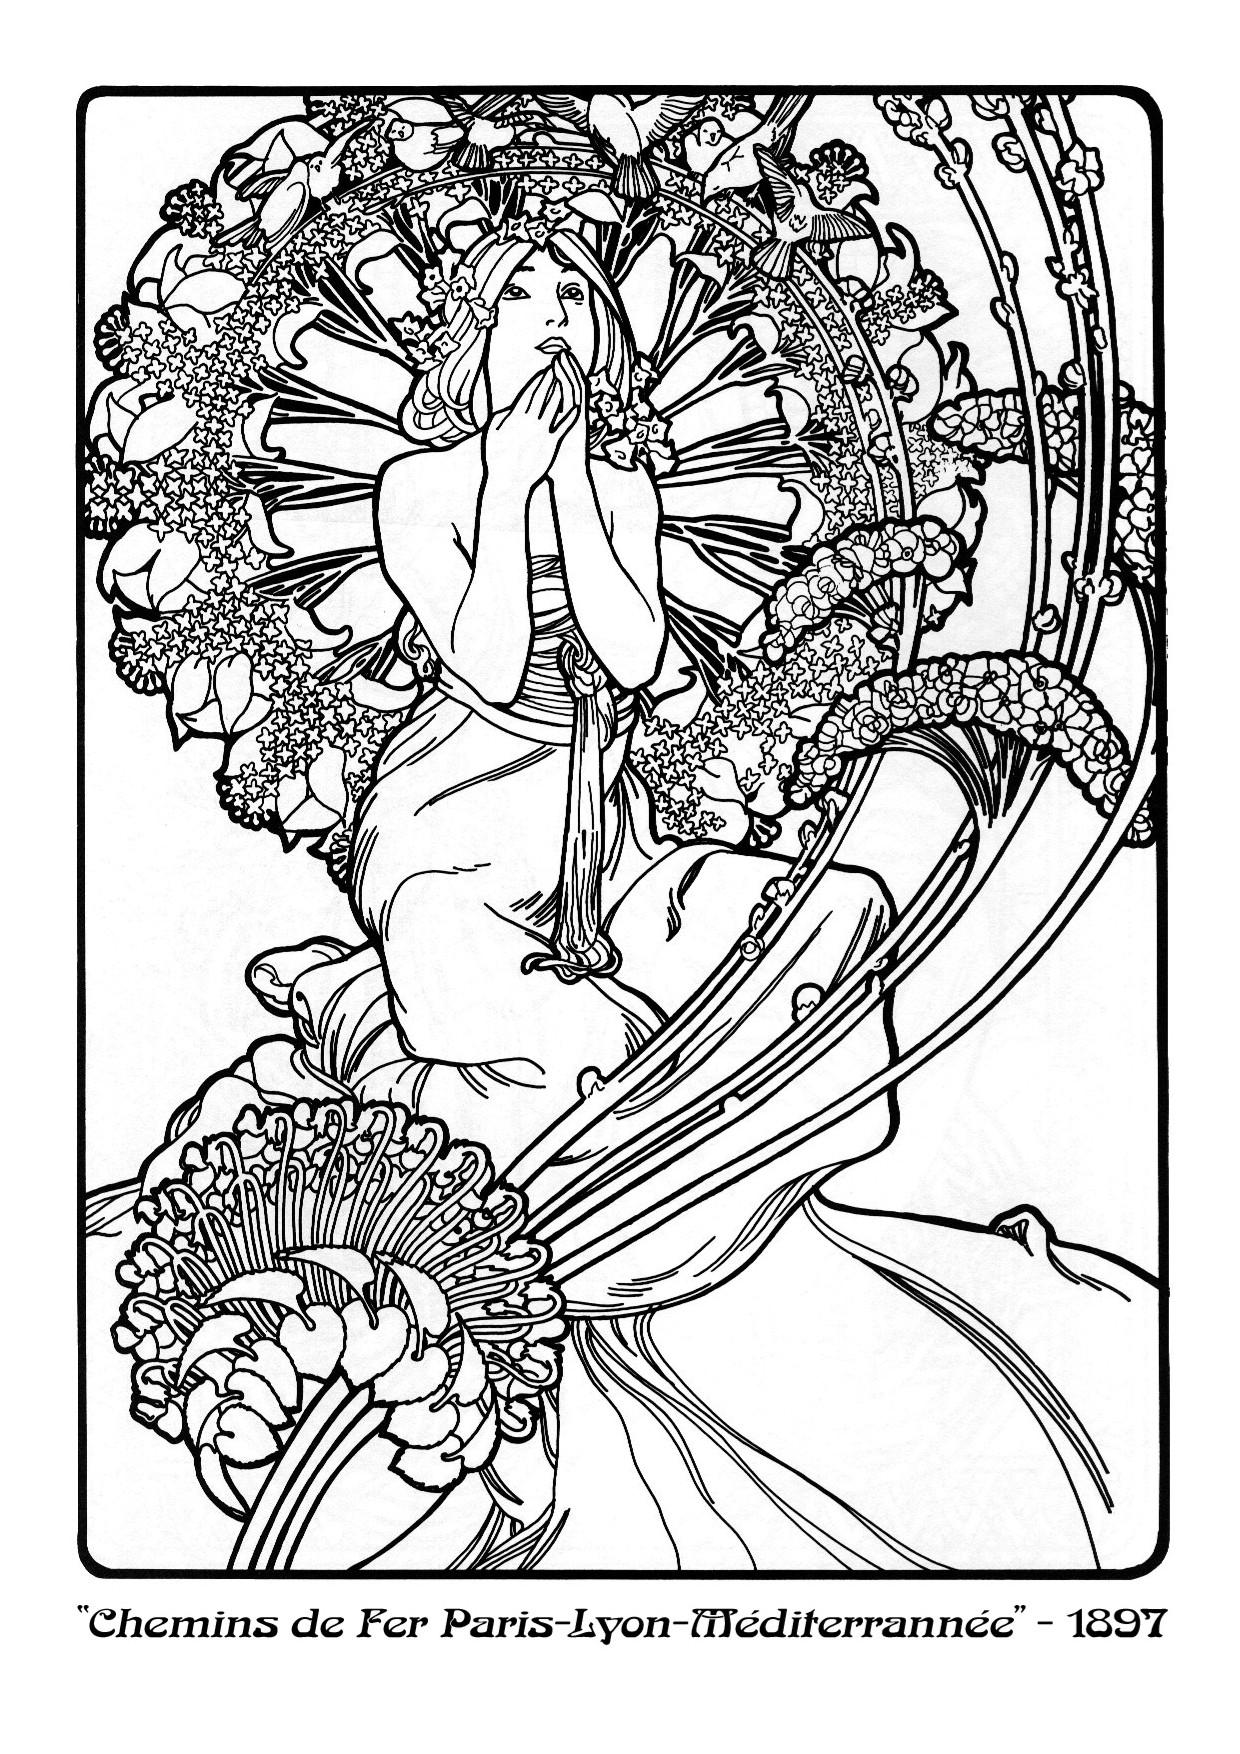 1240x1754 Alphonse Mucha Coloring Pages Alphonse Mucha, Line Art